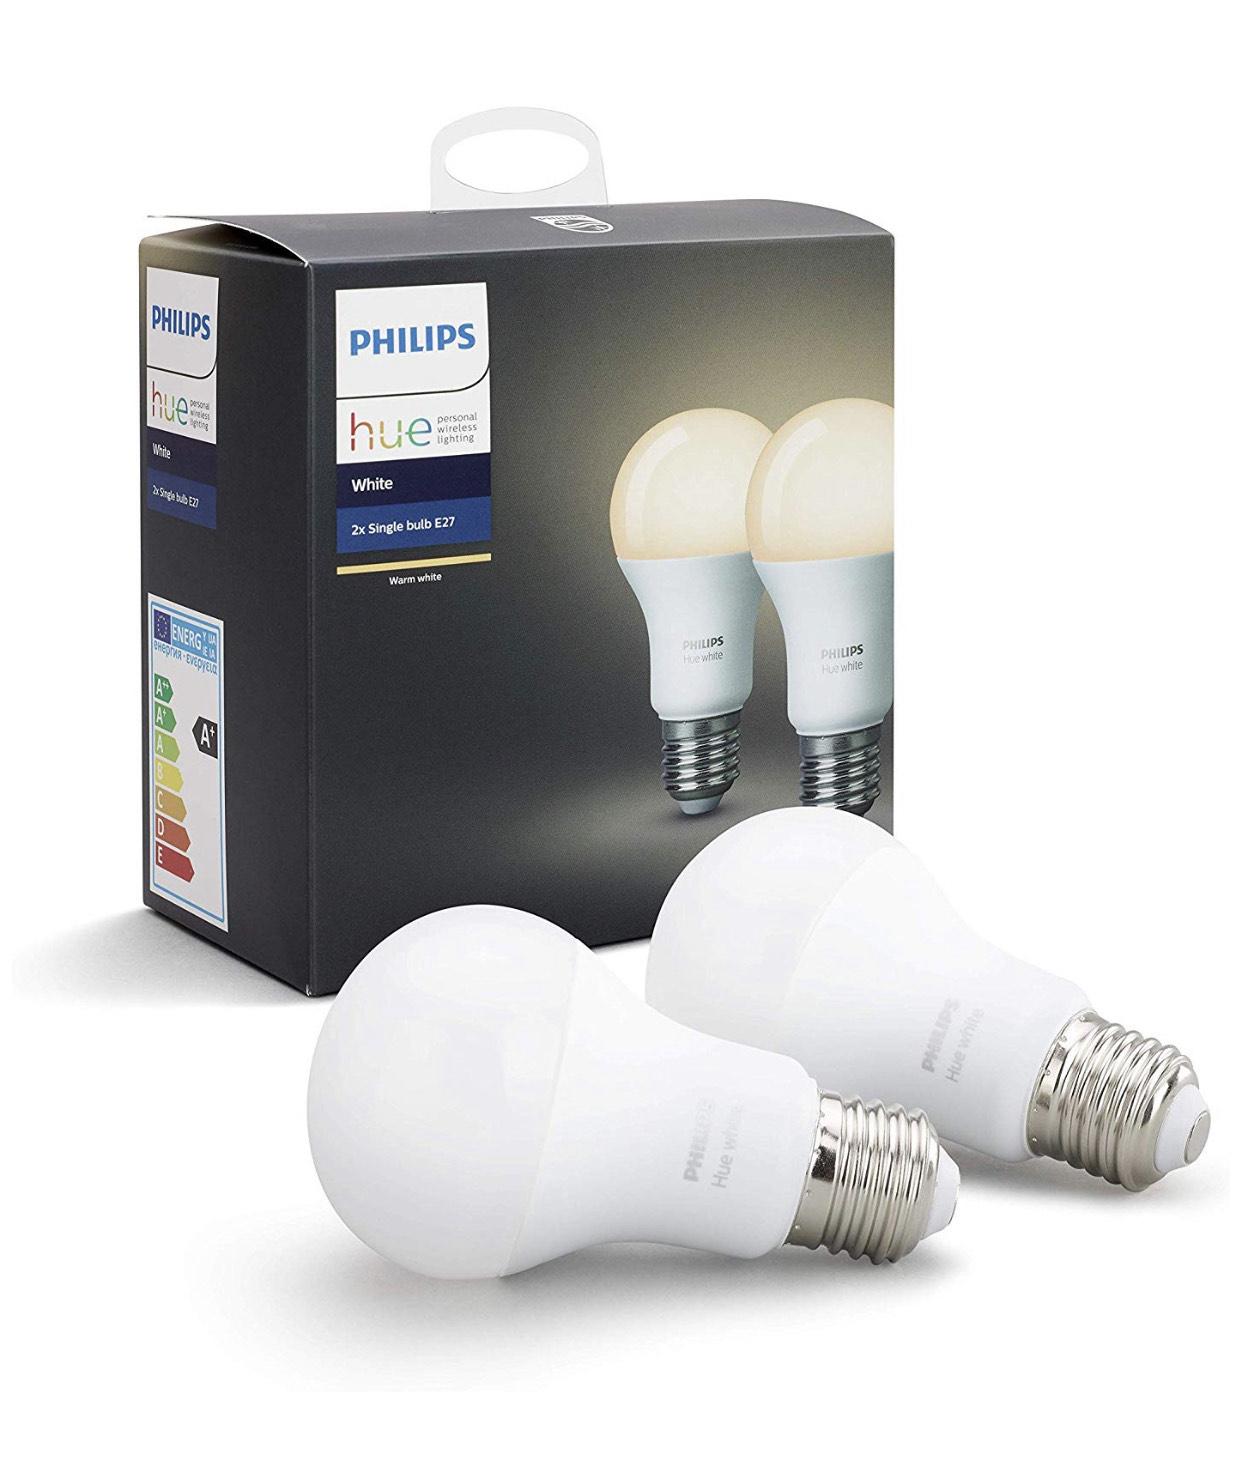 2 mal Philips Hue E27 White Lampe für 18,84€ inkl. Versand